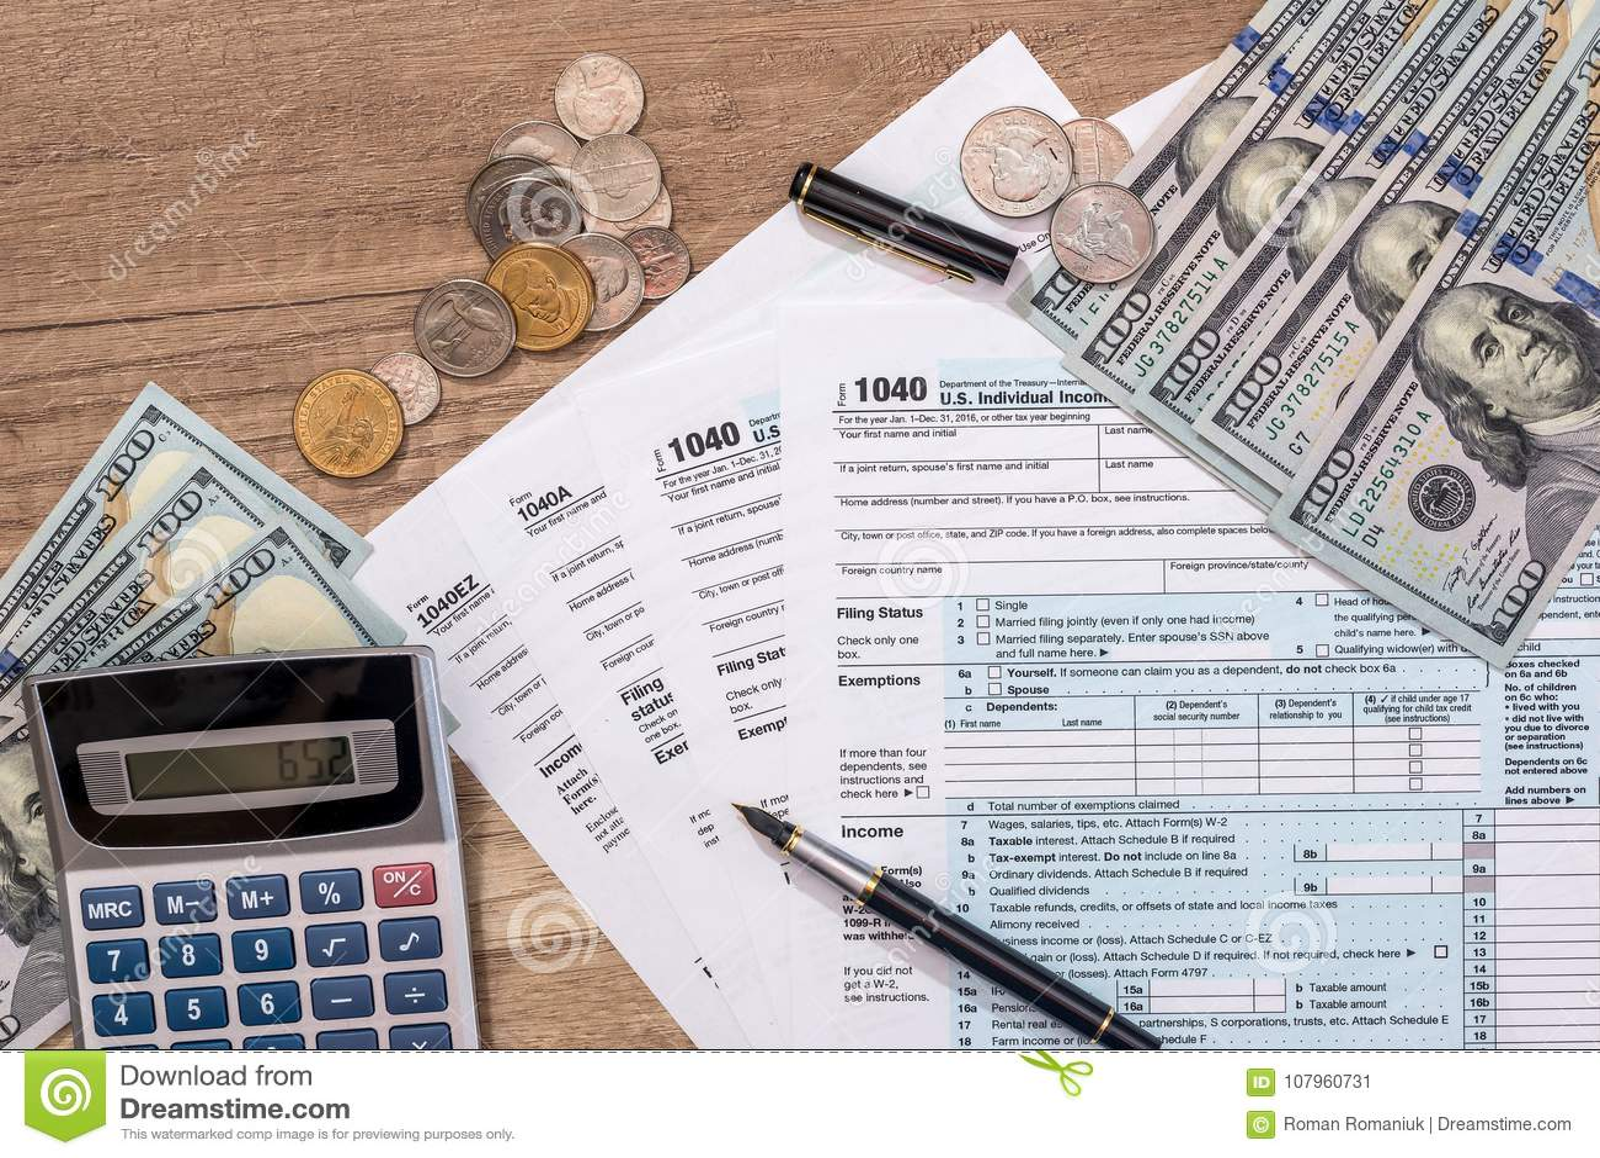 Still life of us money and calculator stock photo: 4406739 alamy.